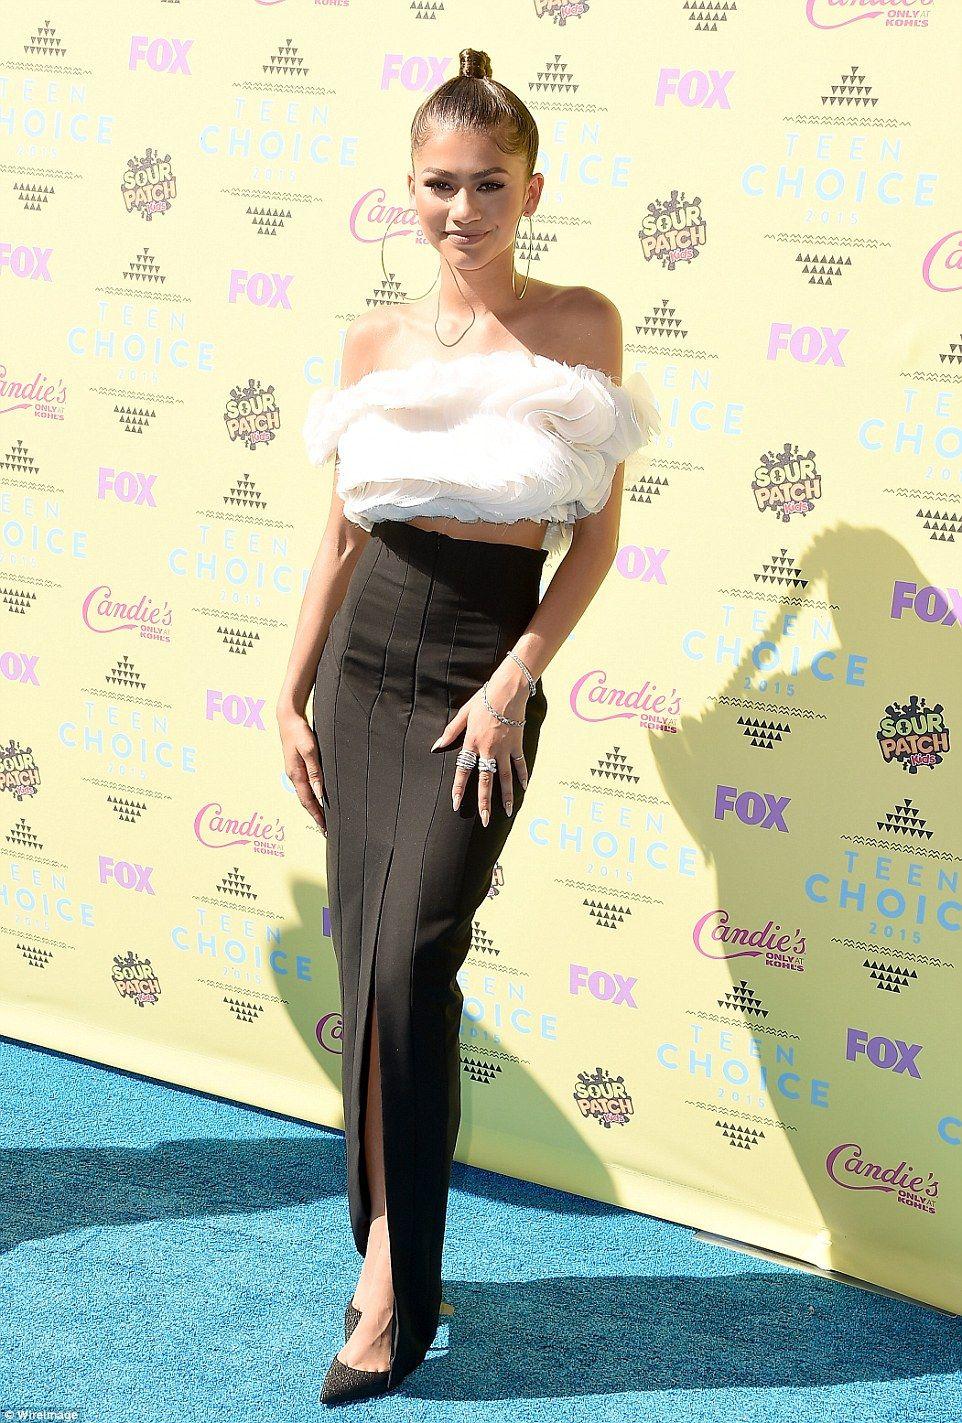 e9e97820e8 ... Teen Choice Awards. Monochrome beauty: Actress Zendaya opted for  dramatic ruffles and a sleek black skirt.